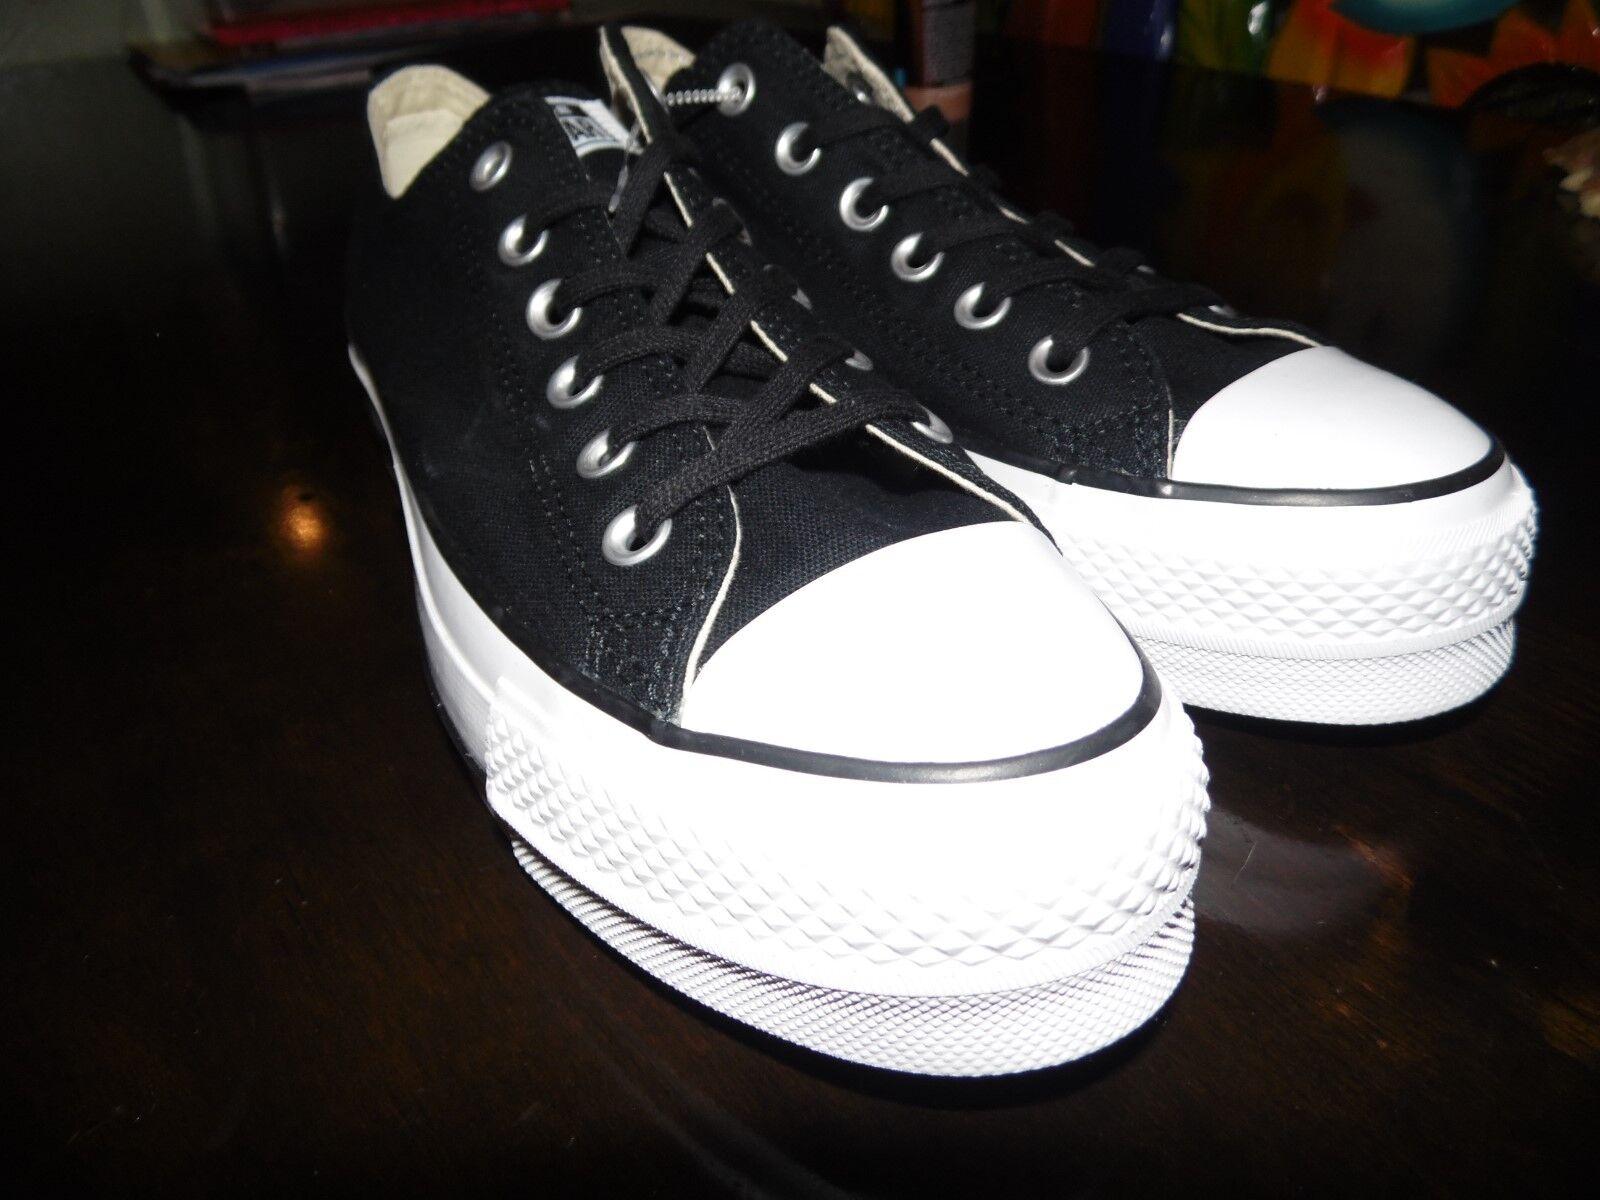 Converse Chuck Taylor All Star Lift OX Platform Black Black Black Women Size 9 shoes 560250C bb02c1